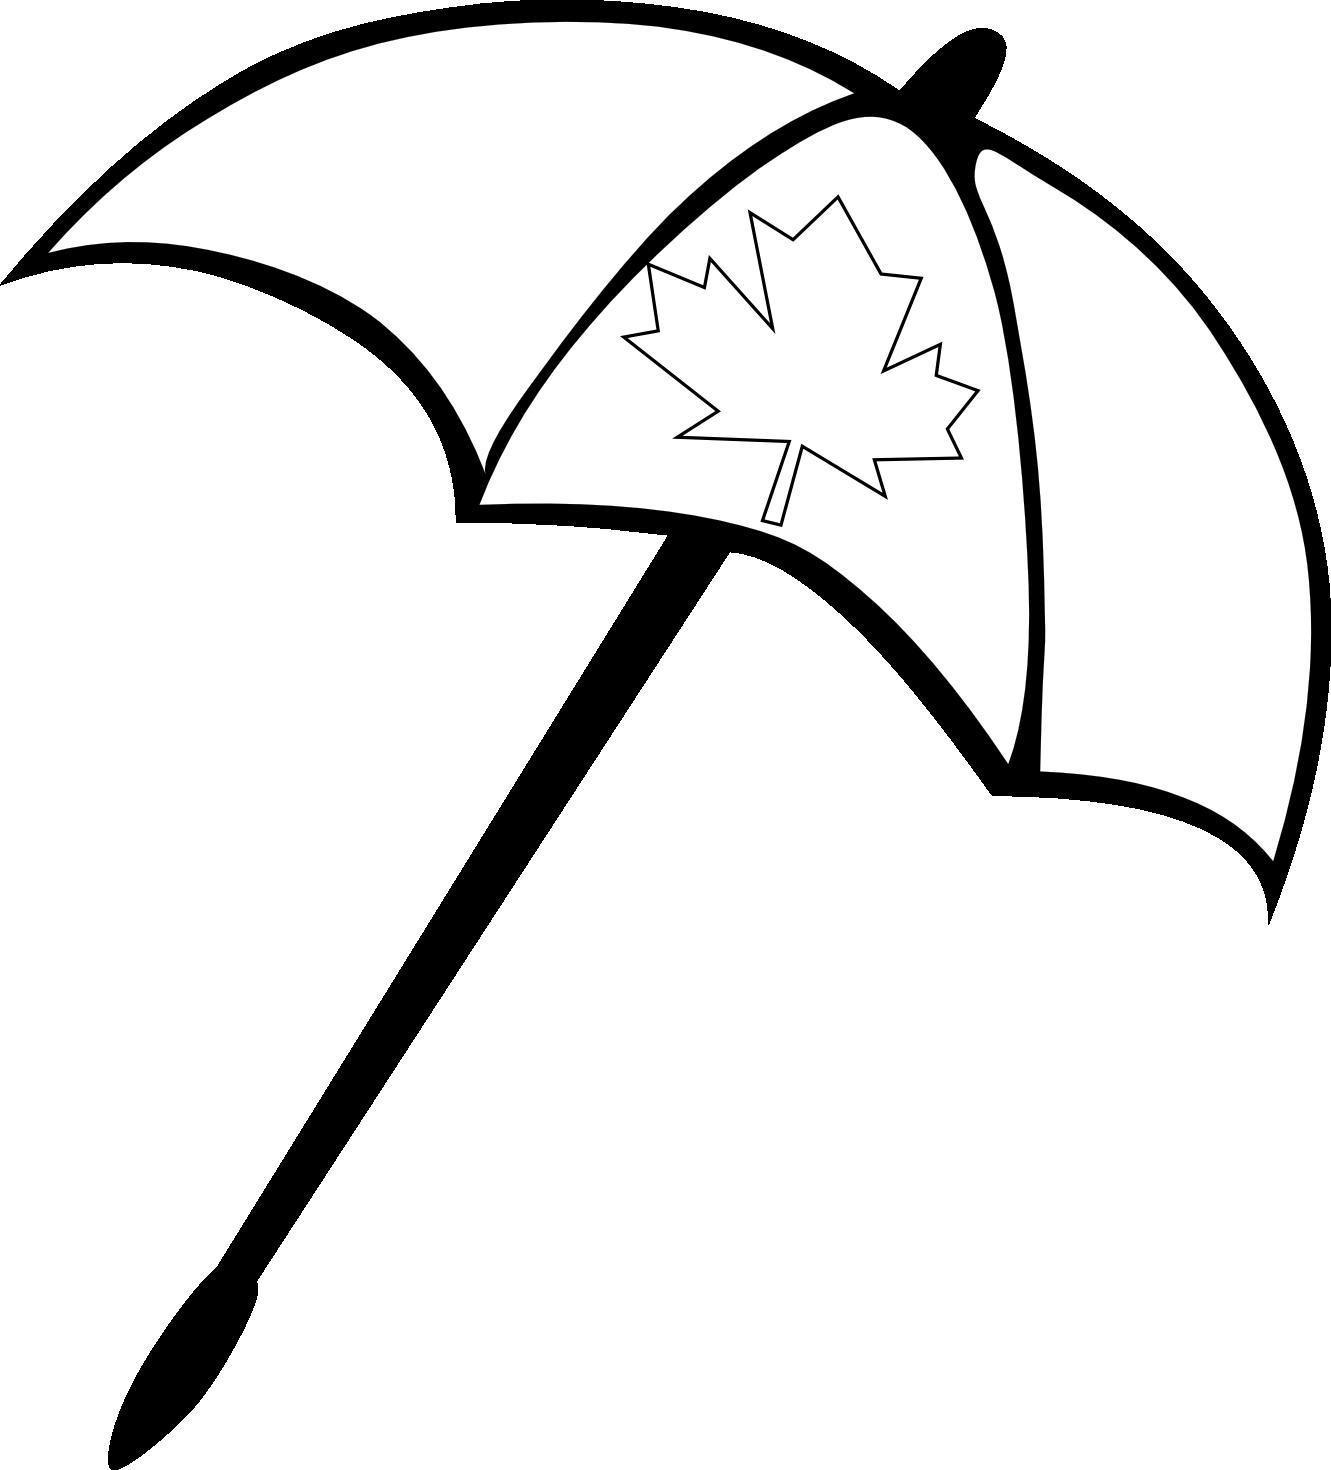 Umbrella black and white umbrella clipart 2